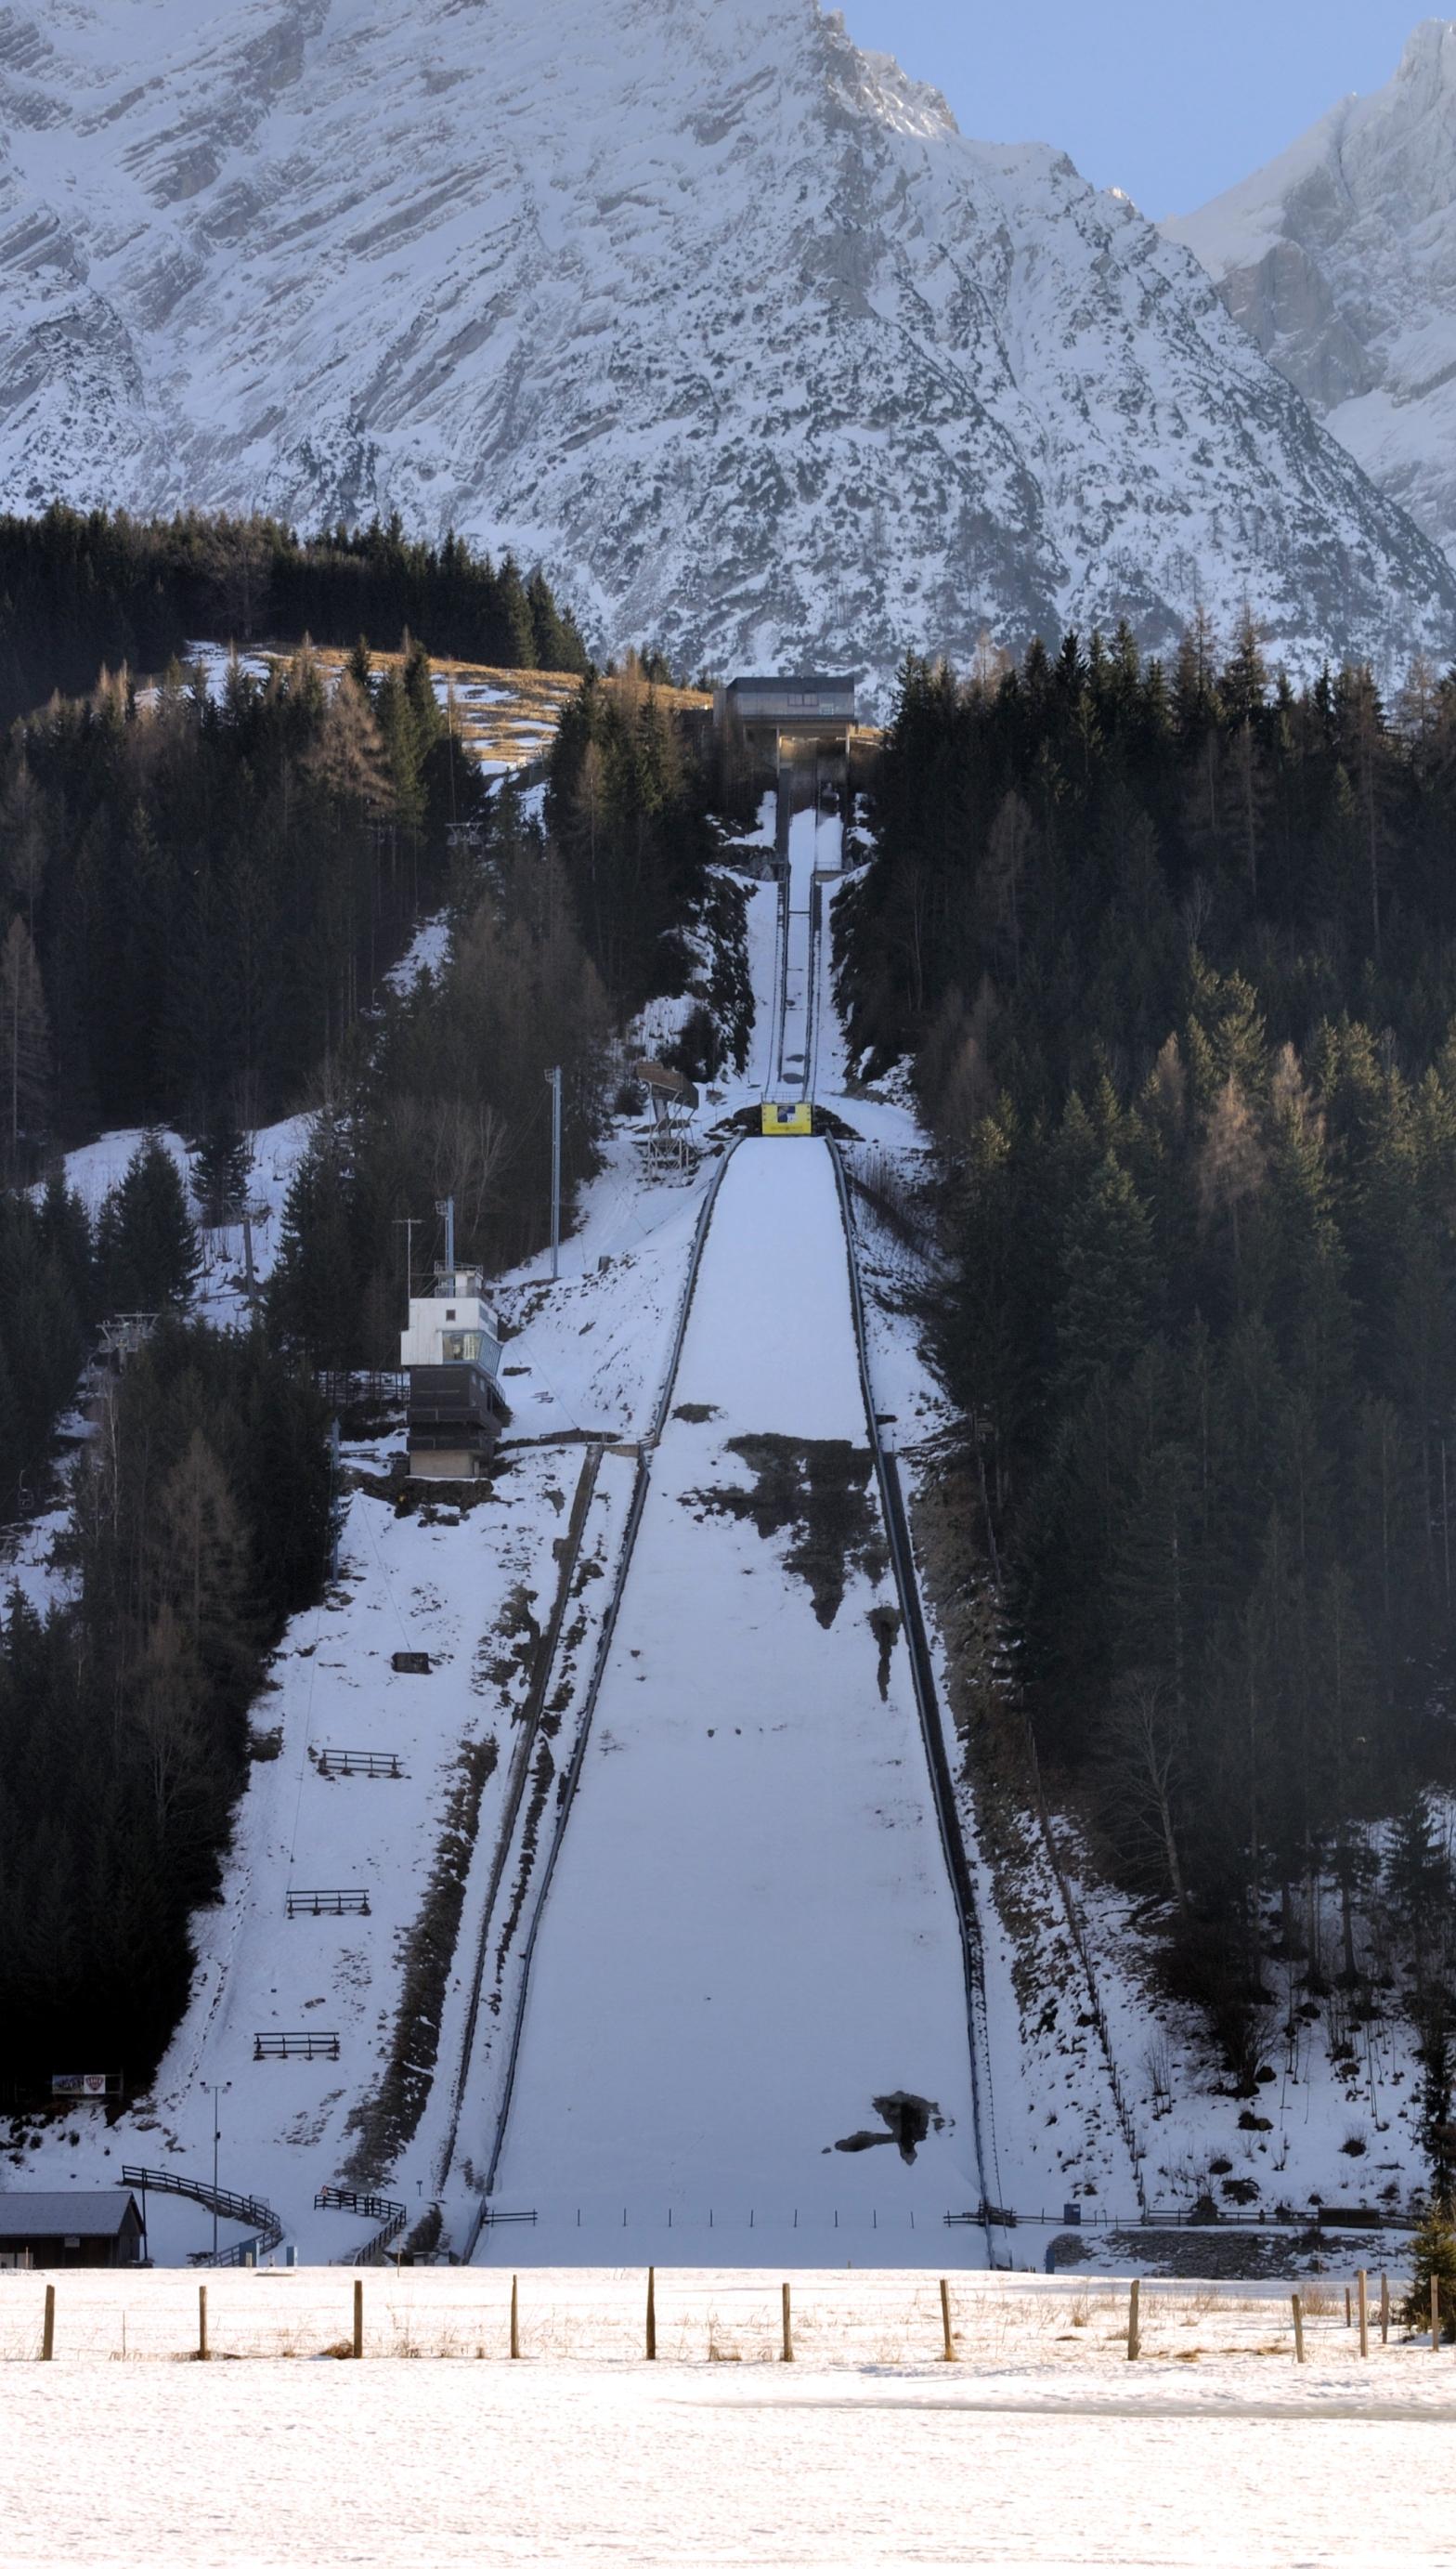 Kulm Skiflugschanze